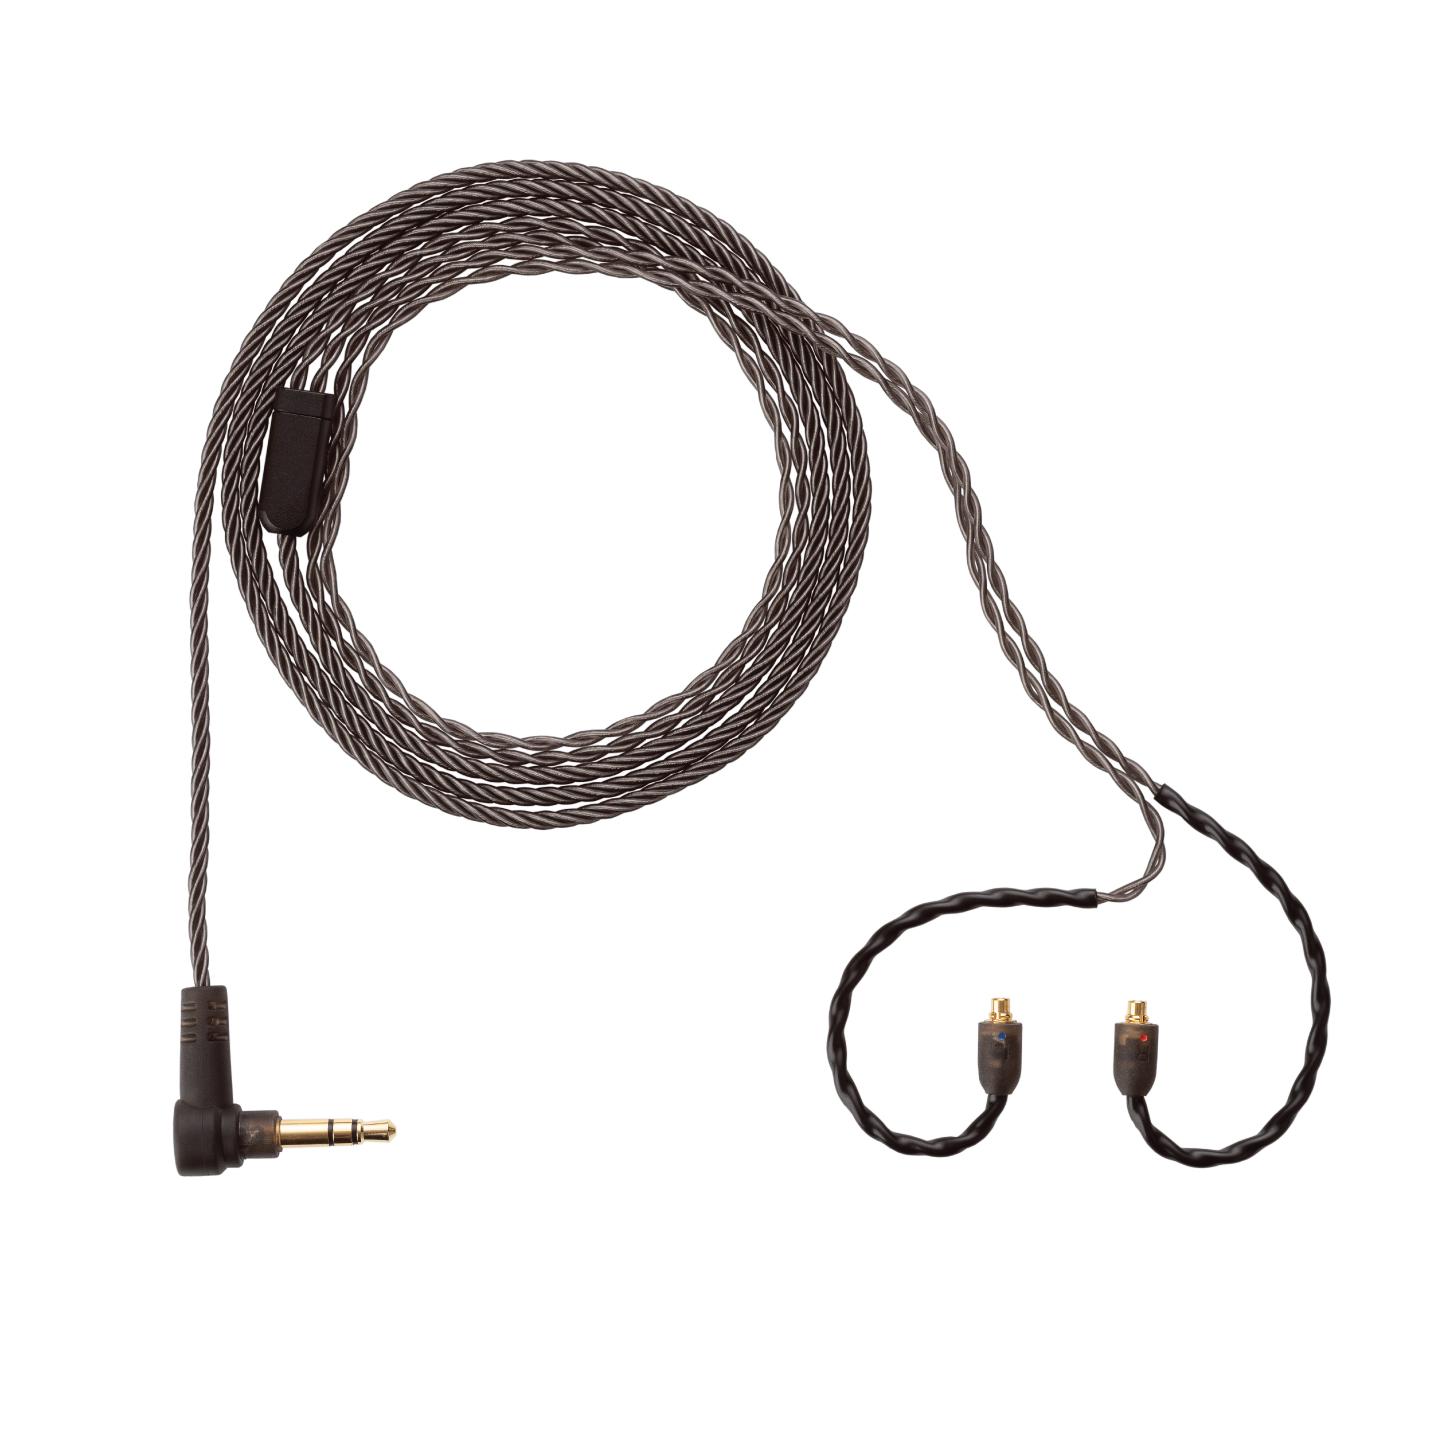 Smoky Lite Litz Cable